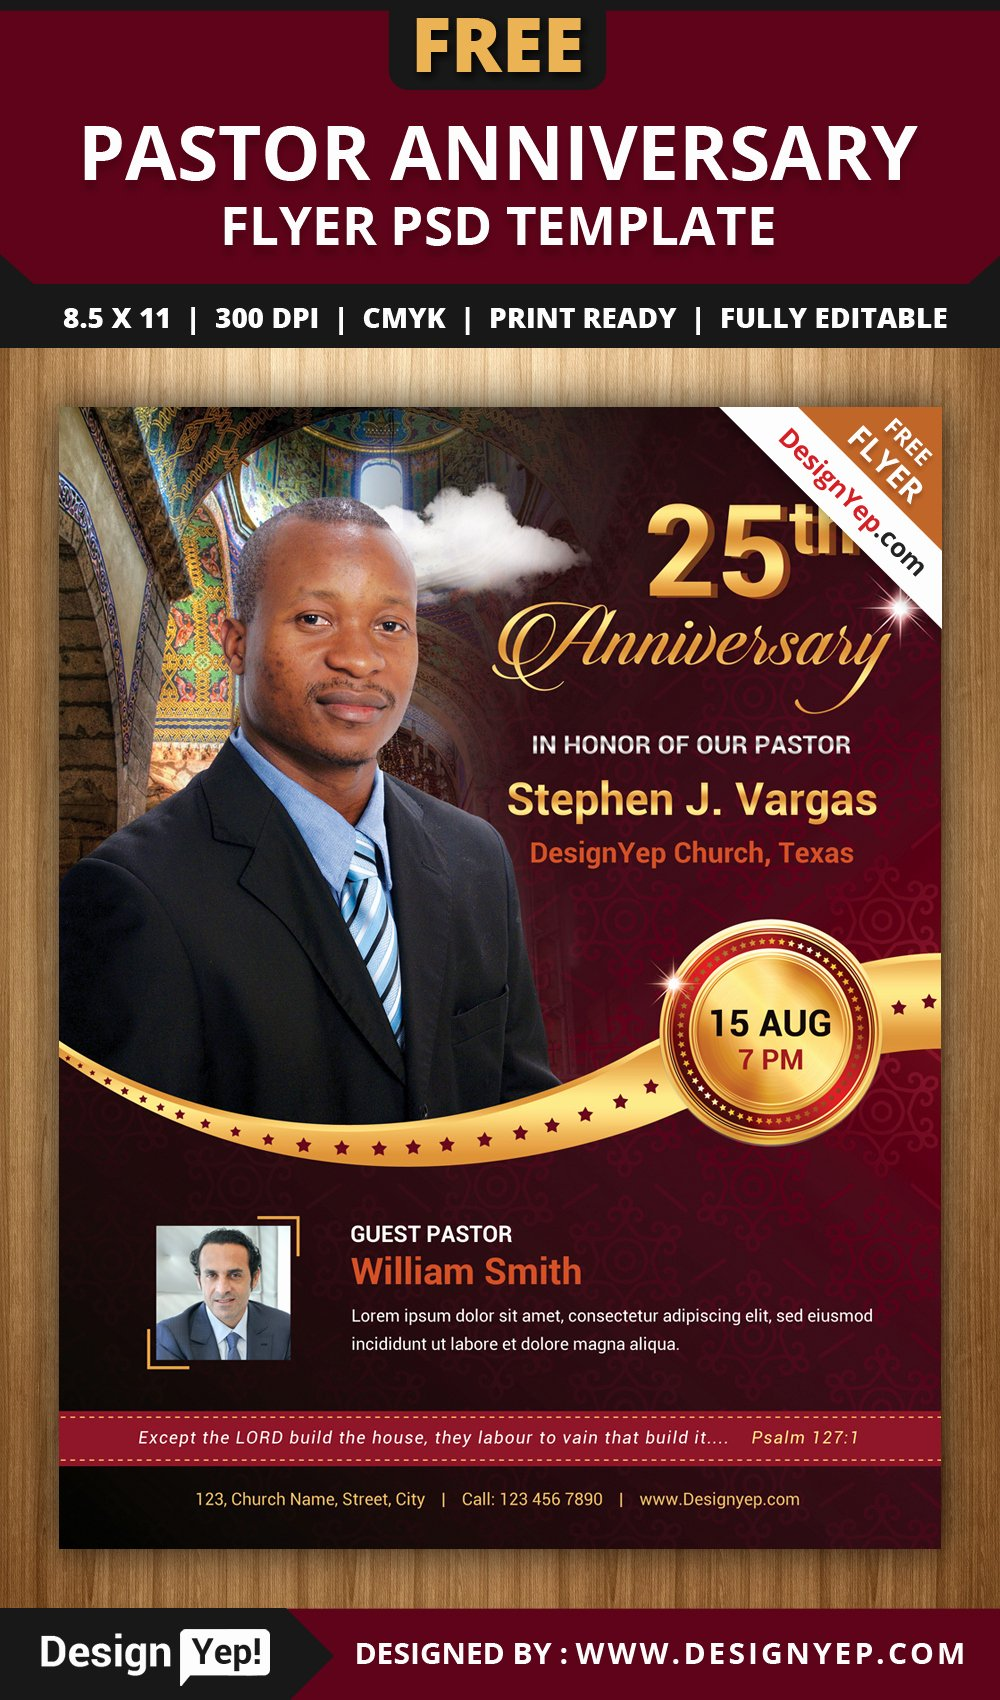 Church Anniversary Program Templates Free Awesome Free Pastor Anniversary Flyer Psd Template On Behance